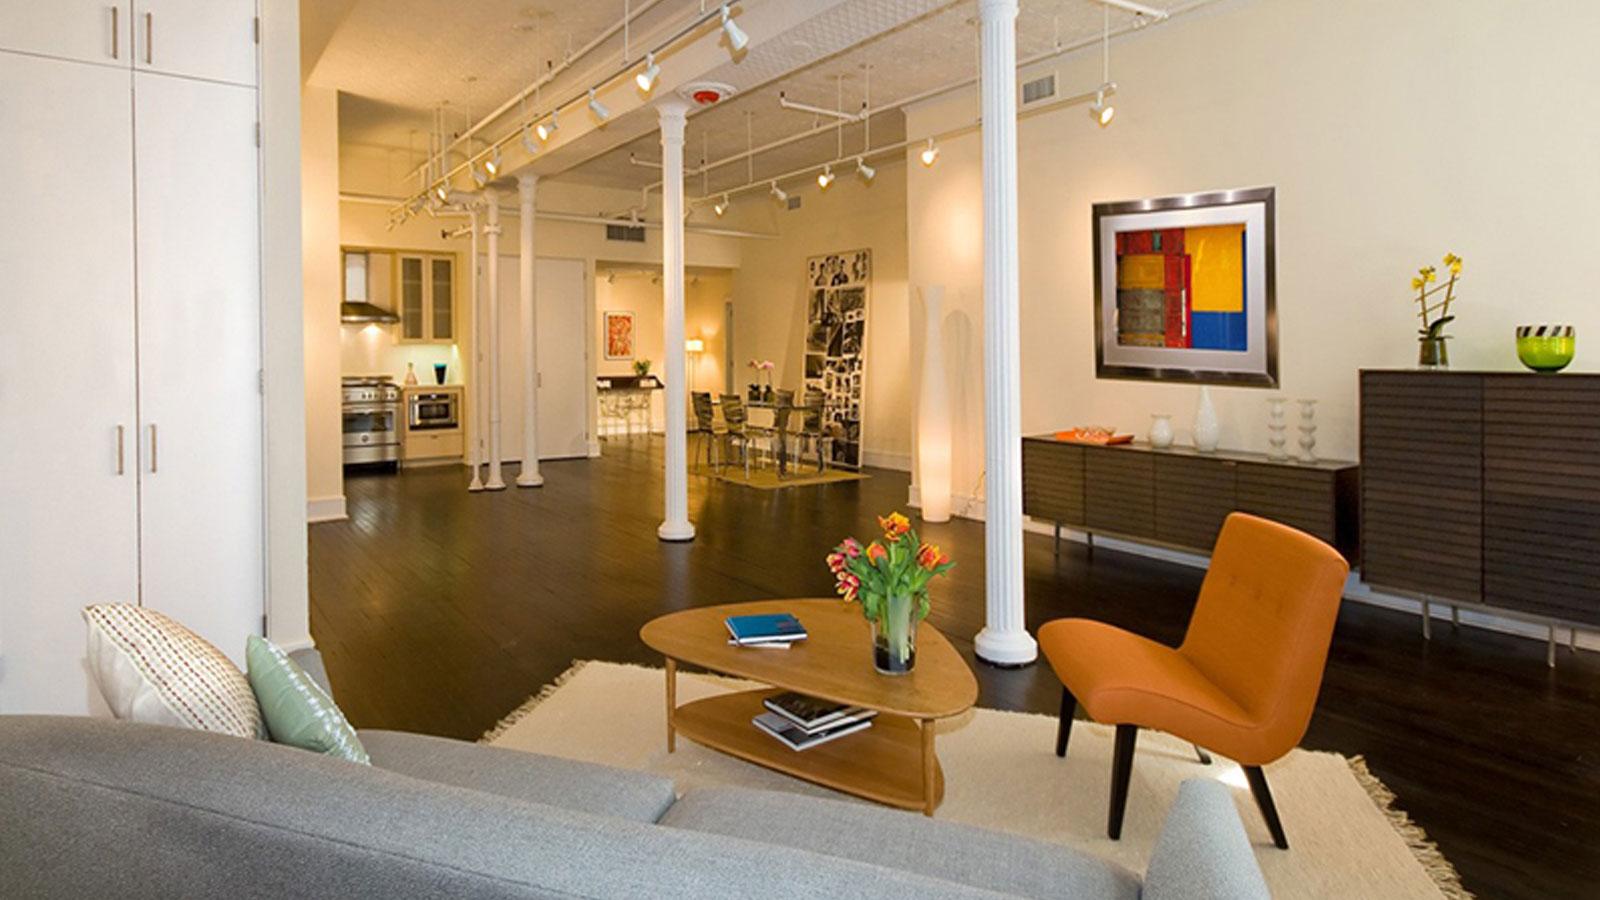 The Tribeca Lofts, 79 Worth Street